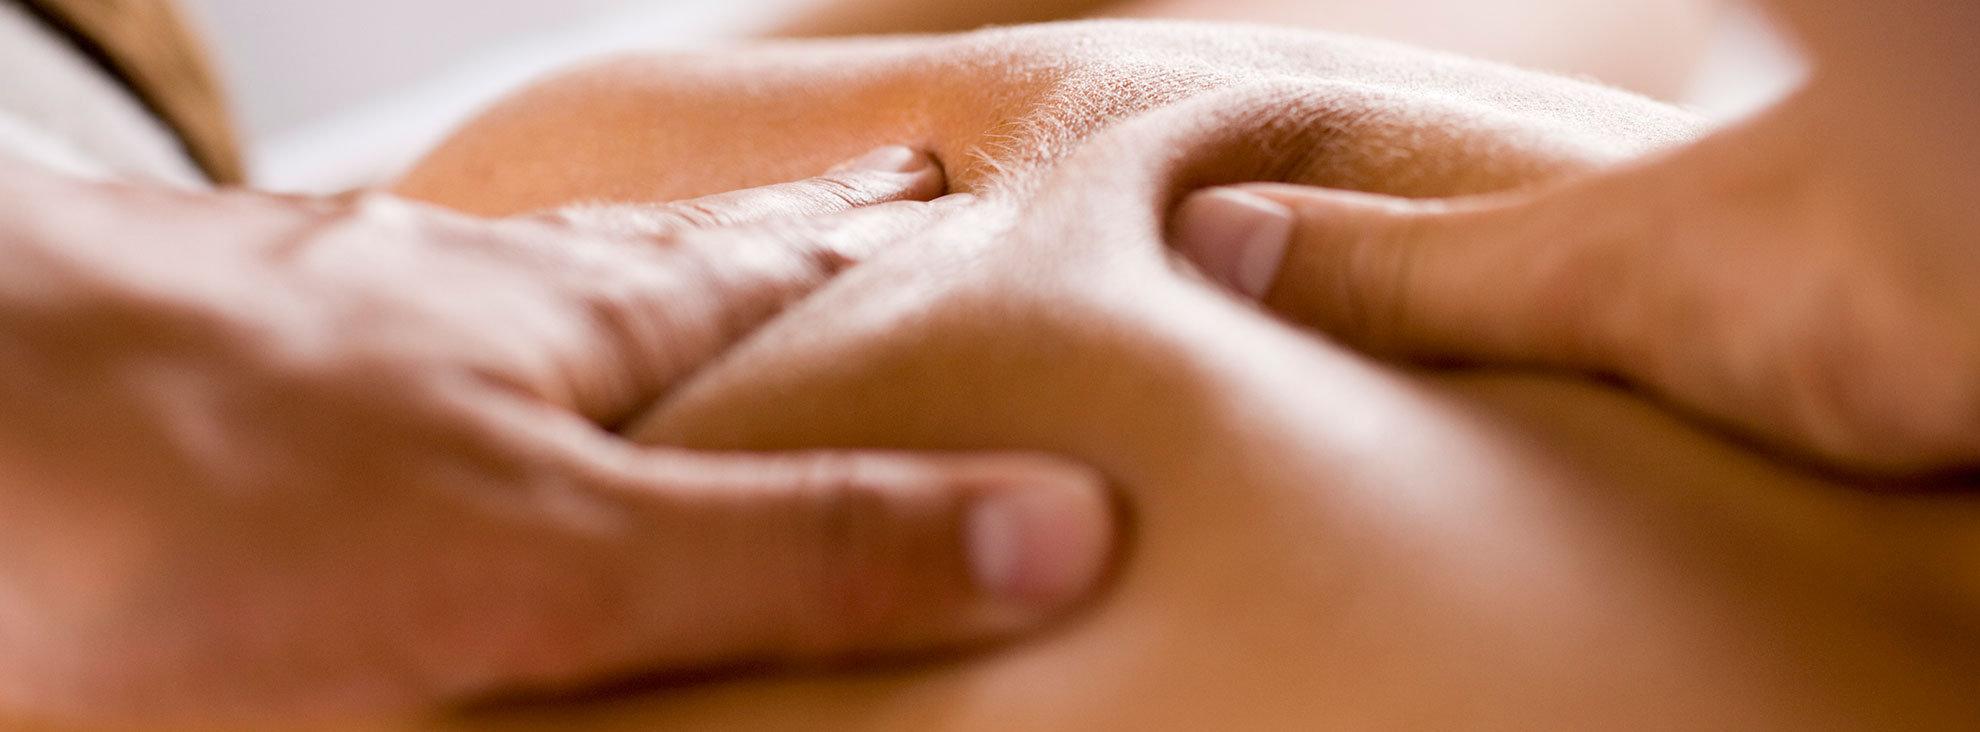 105 Minute Therapeutic Massage